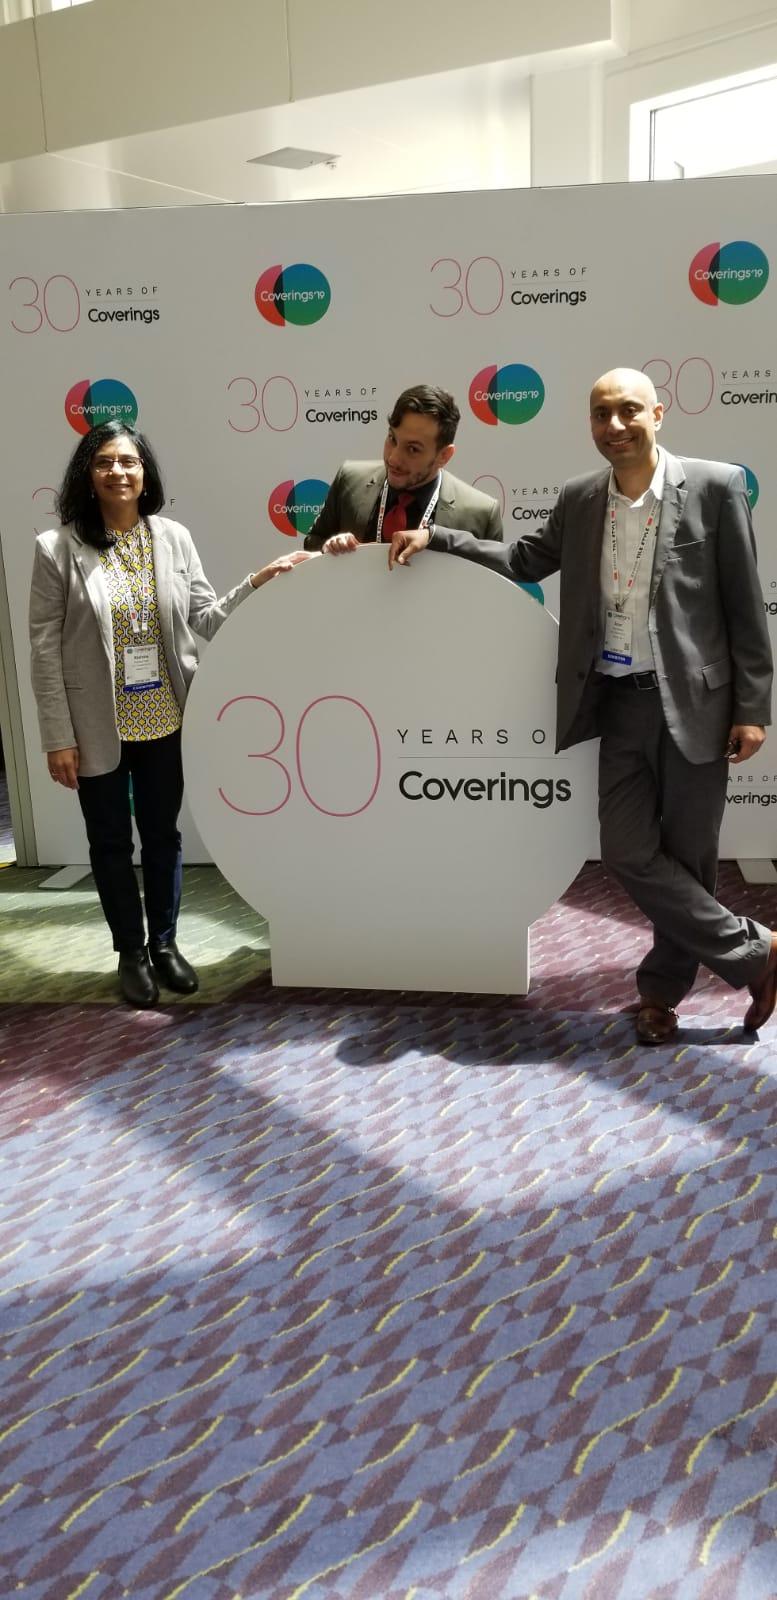 Rishma Patel, Manoel Versolato, & Arun Nikkan